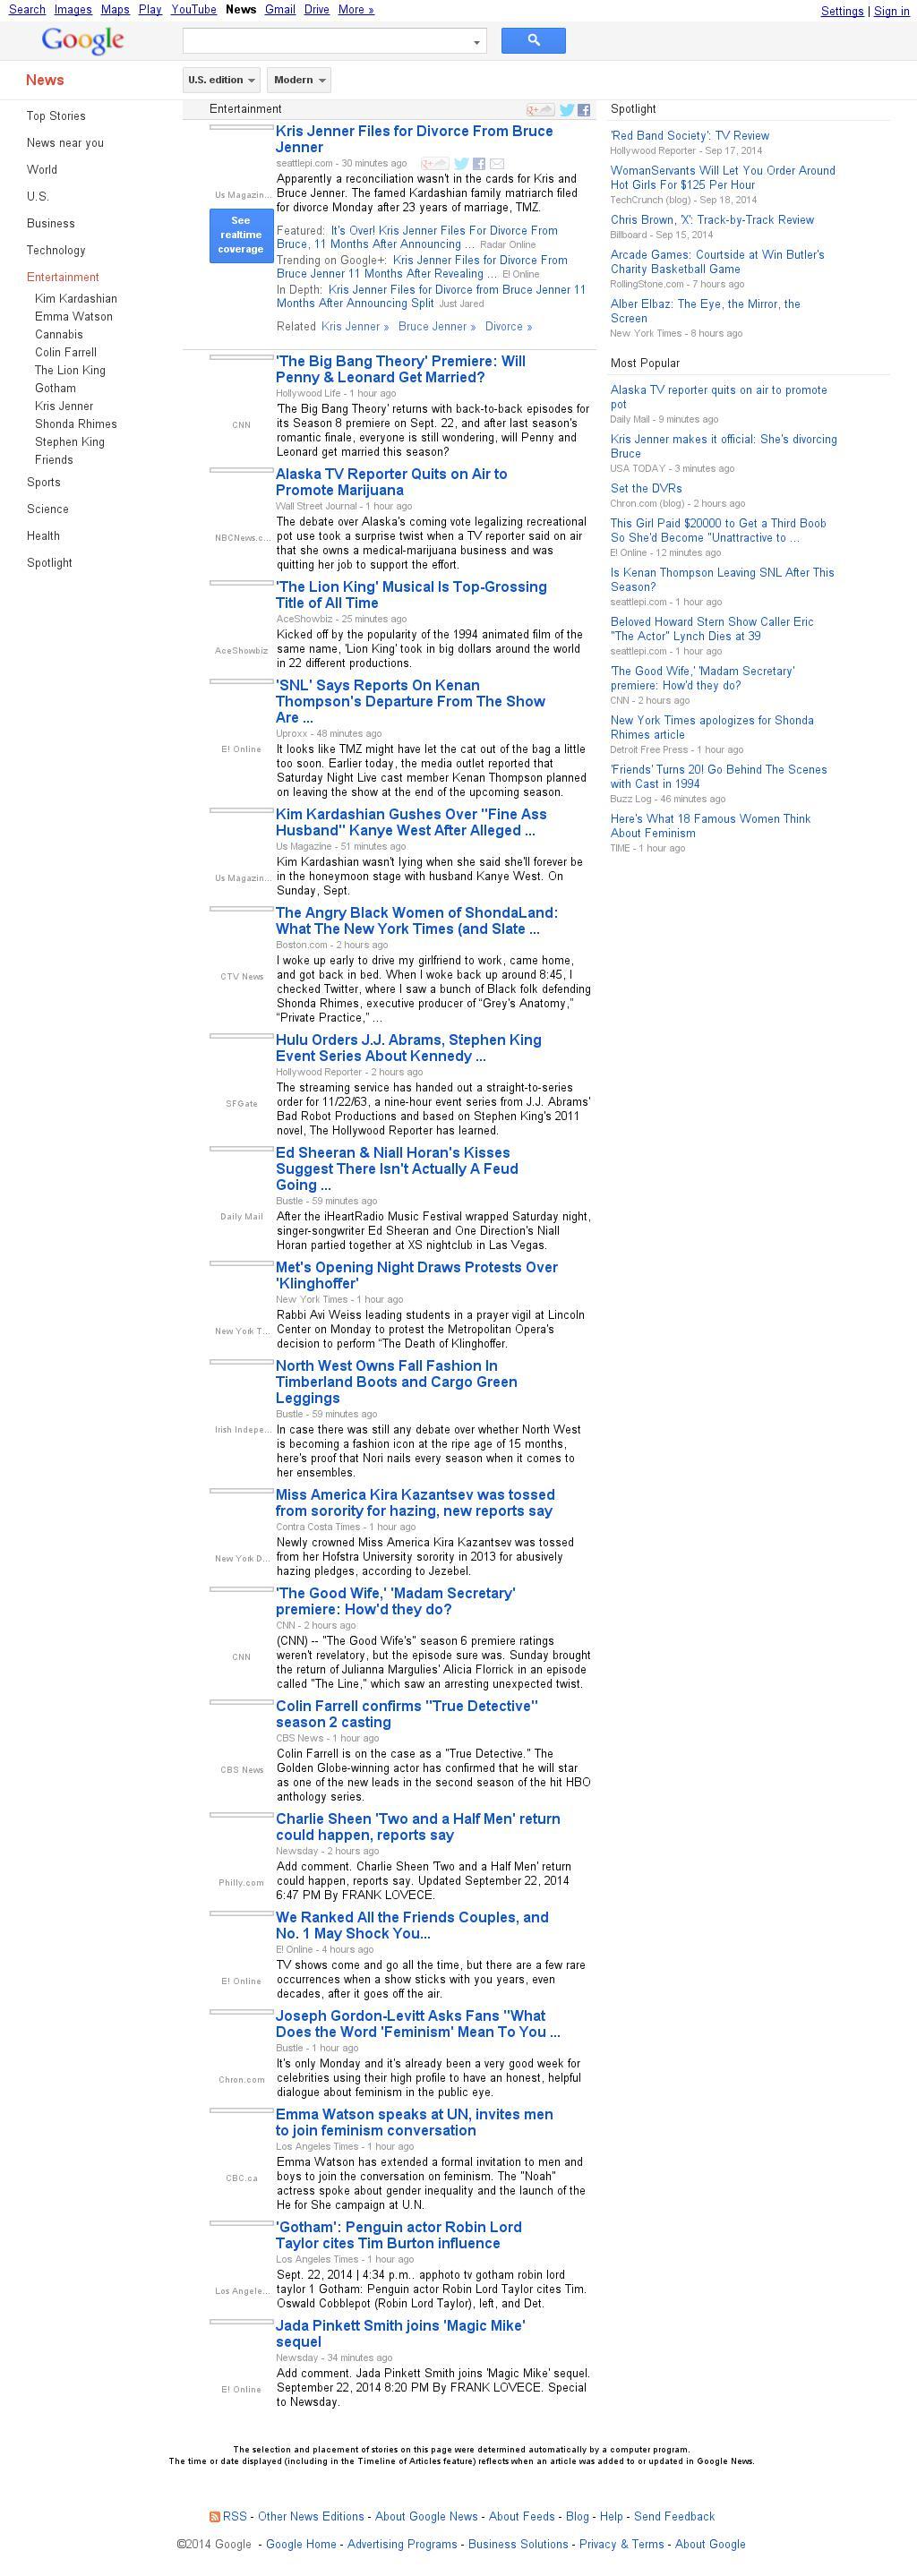 Google News: Entertainment at Tuesday Sept. 23, 2014, 1:08 a.m. UTC